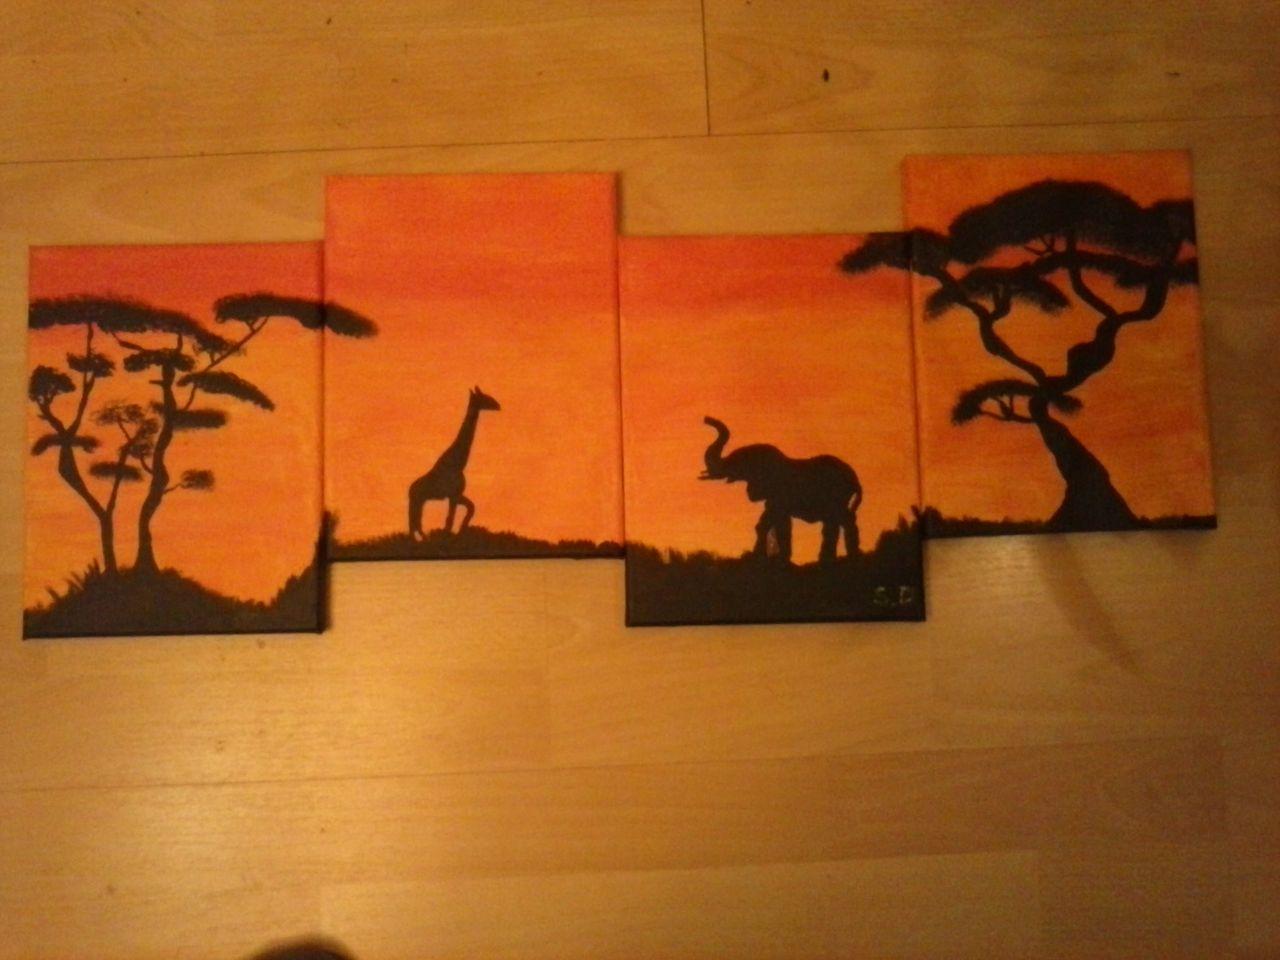 bild afrika acrylmalerei malerei von stefan digel bei kunstnet. Black Bedroom Furniture Sets. Home Design Ideas